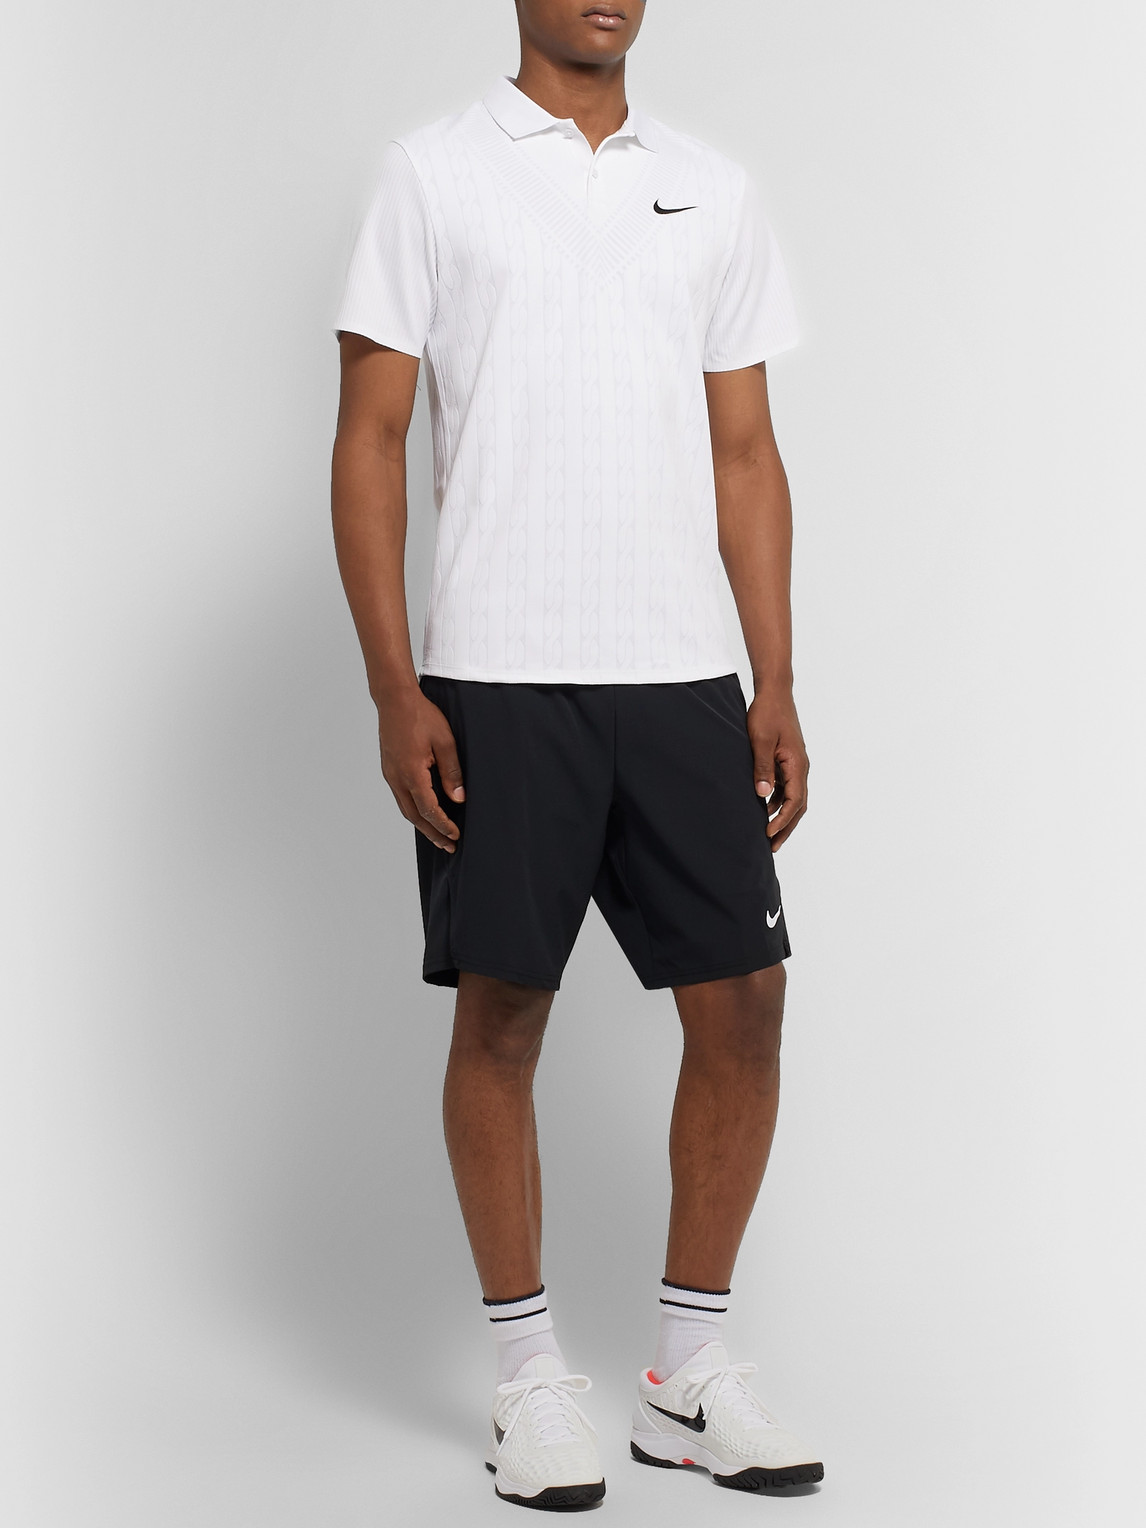 Nike Tops SLIM